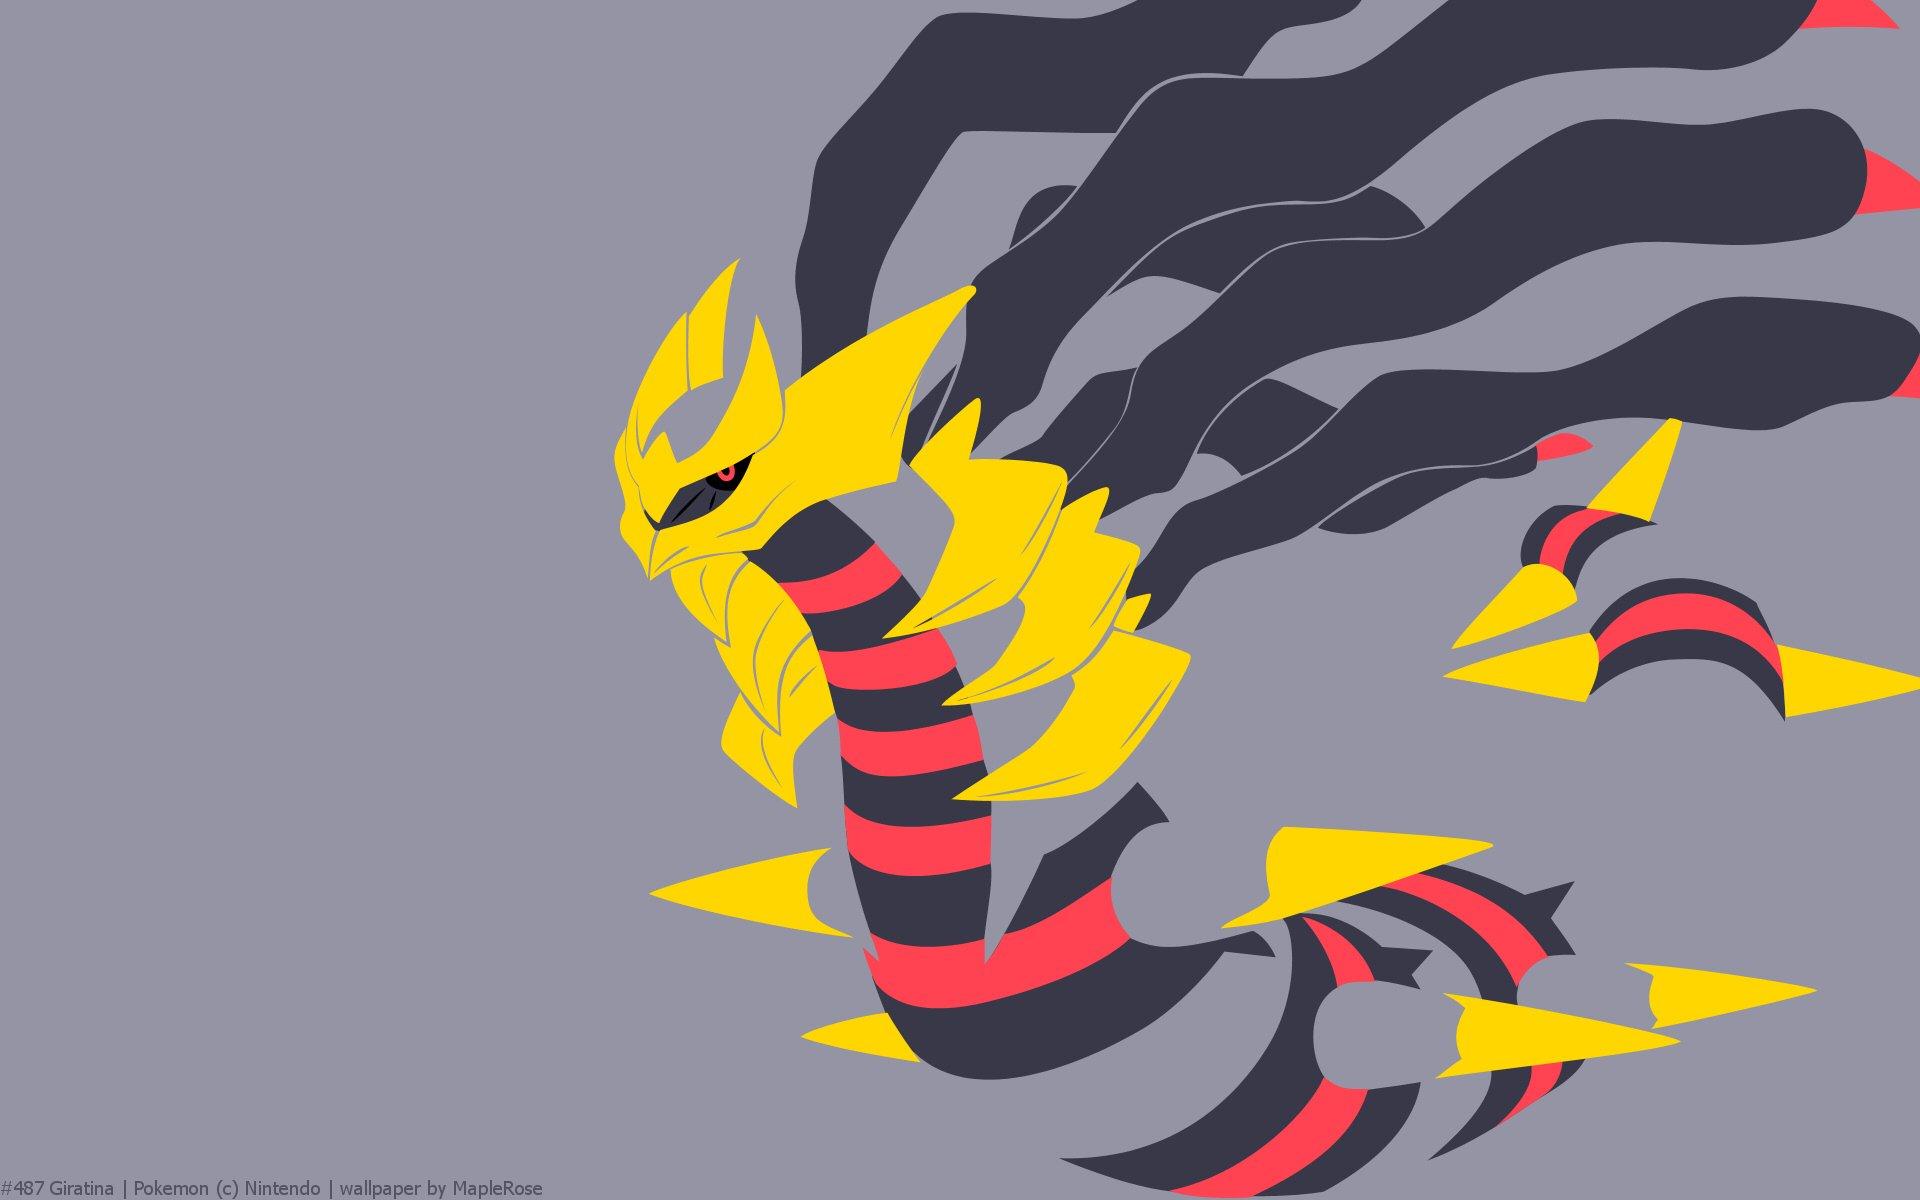 giratina pokemon go